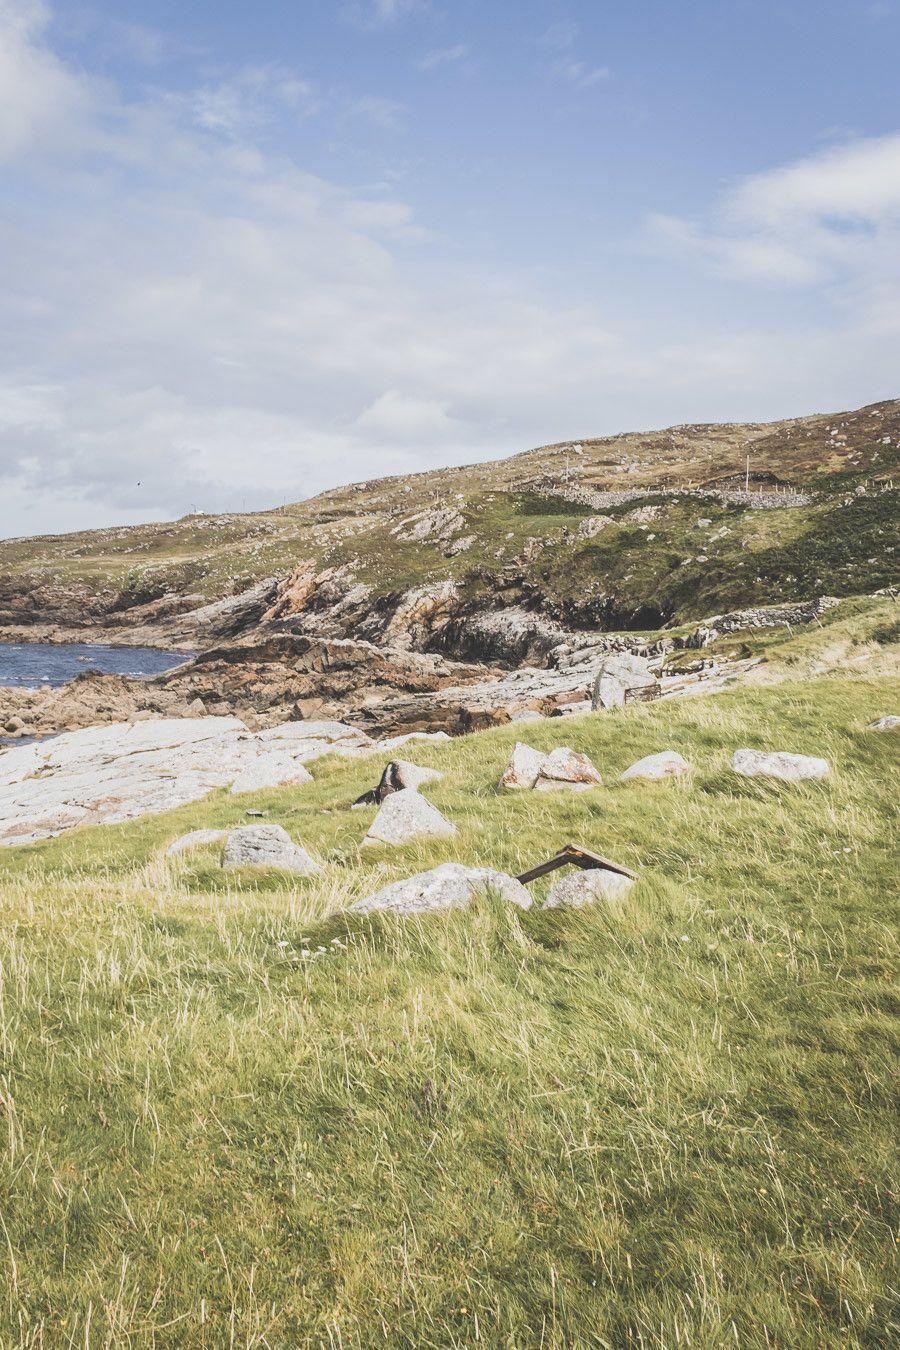 irlande - mer et herbe verdoyante